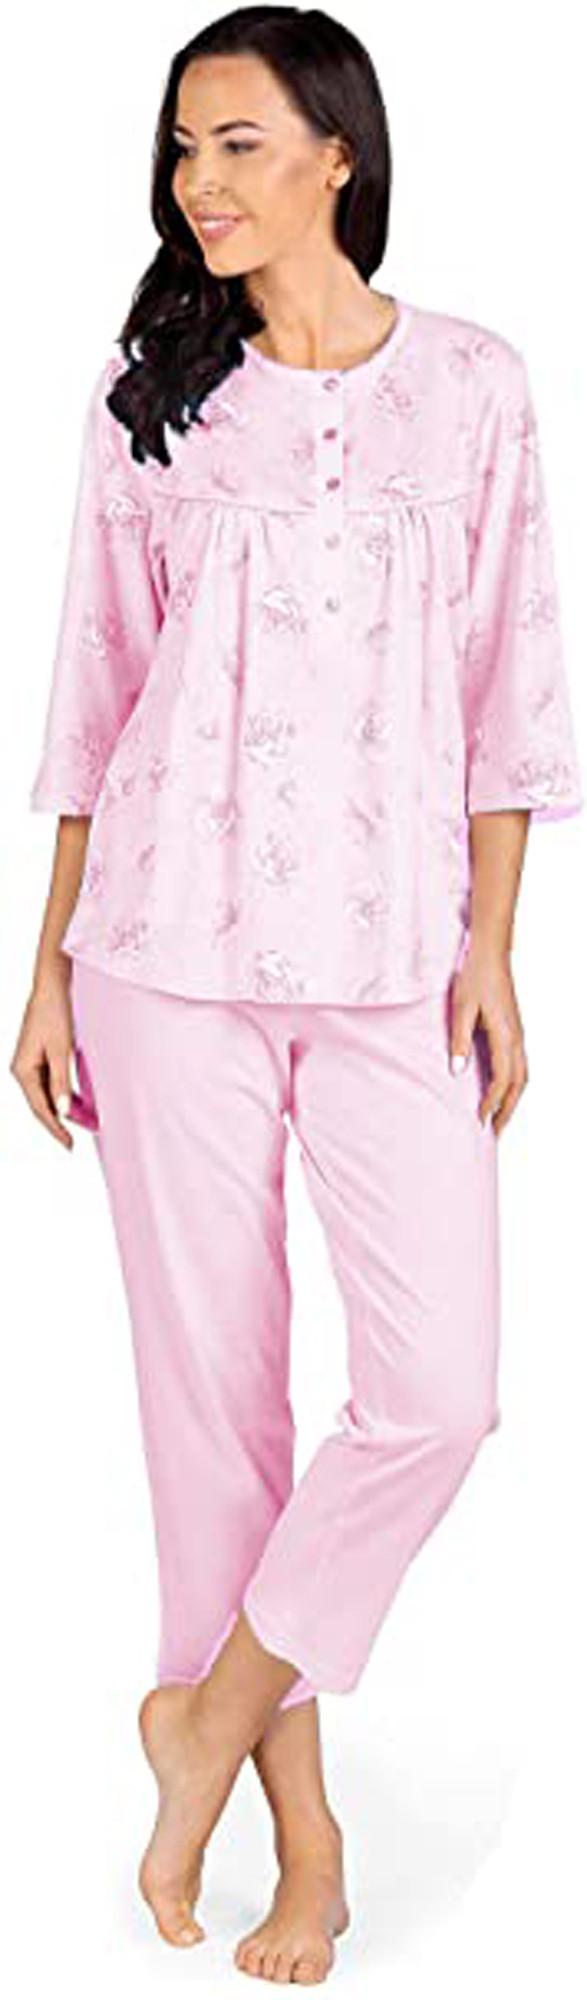 Comtessa Damen Schlafanzug halber Arm Rosa 38 40 42 44 46 48 50 52 54 56 58 100% Baumwolle